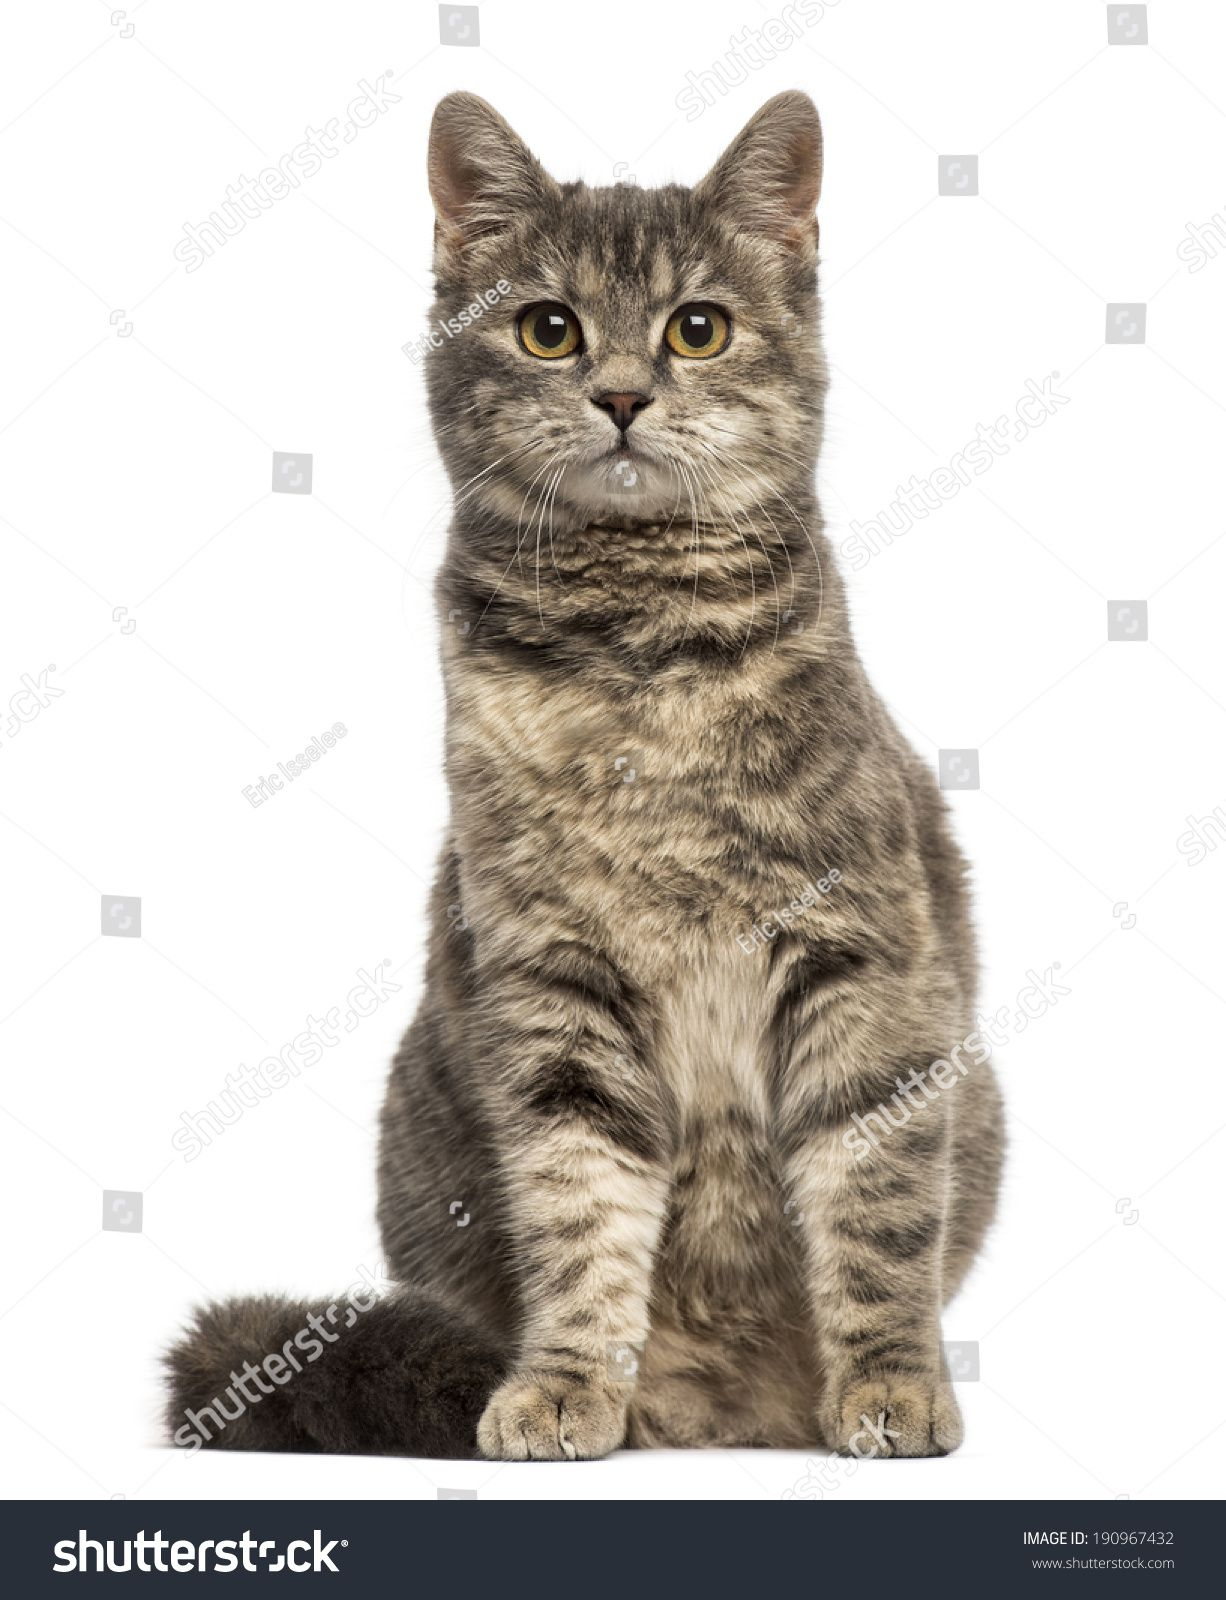 European Shorthair 6 Months Old Sitting In 2020 Cats Animals Cat Health